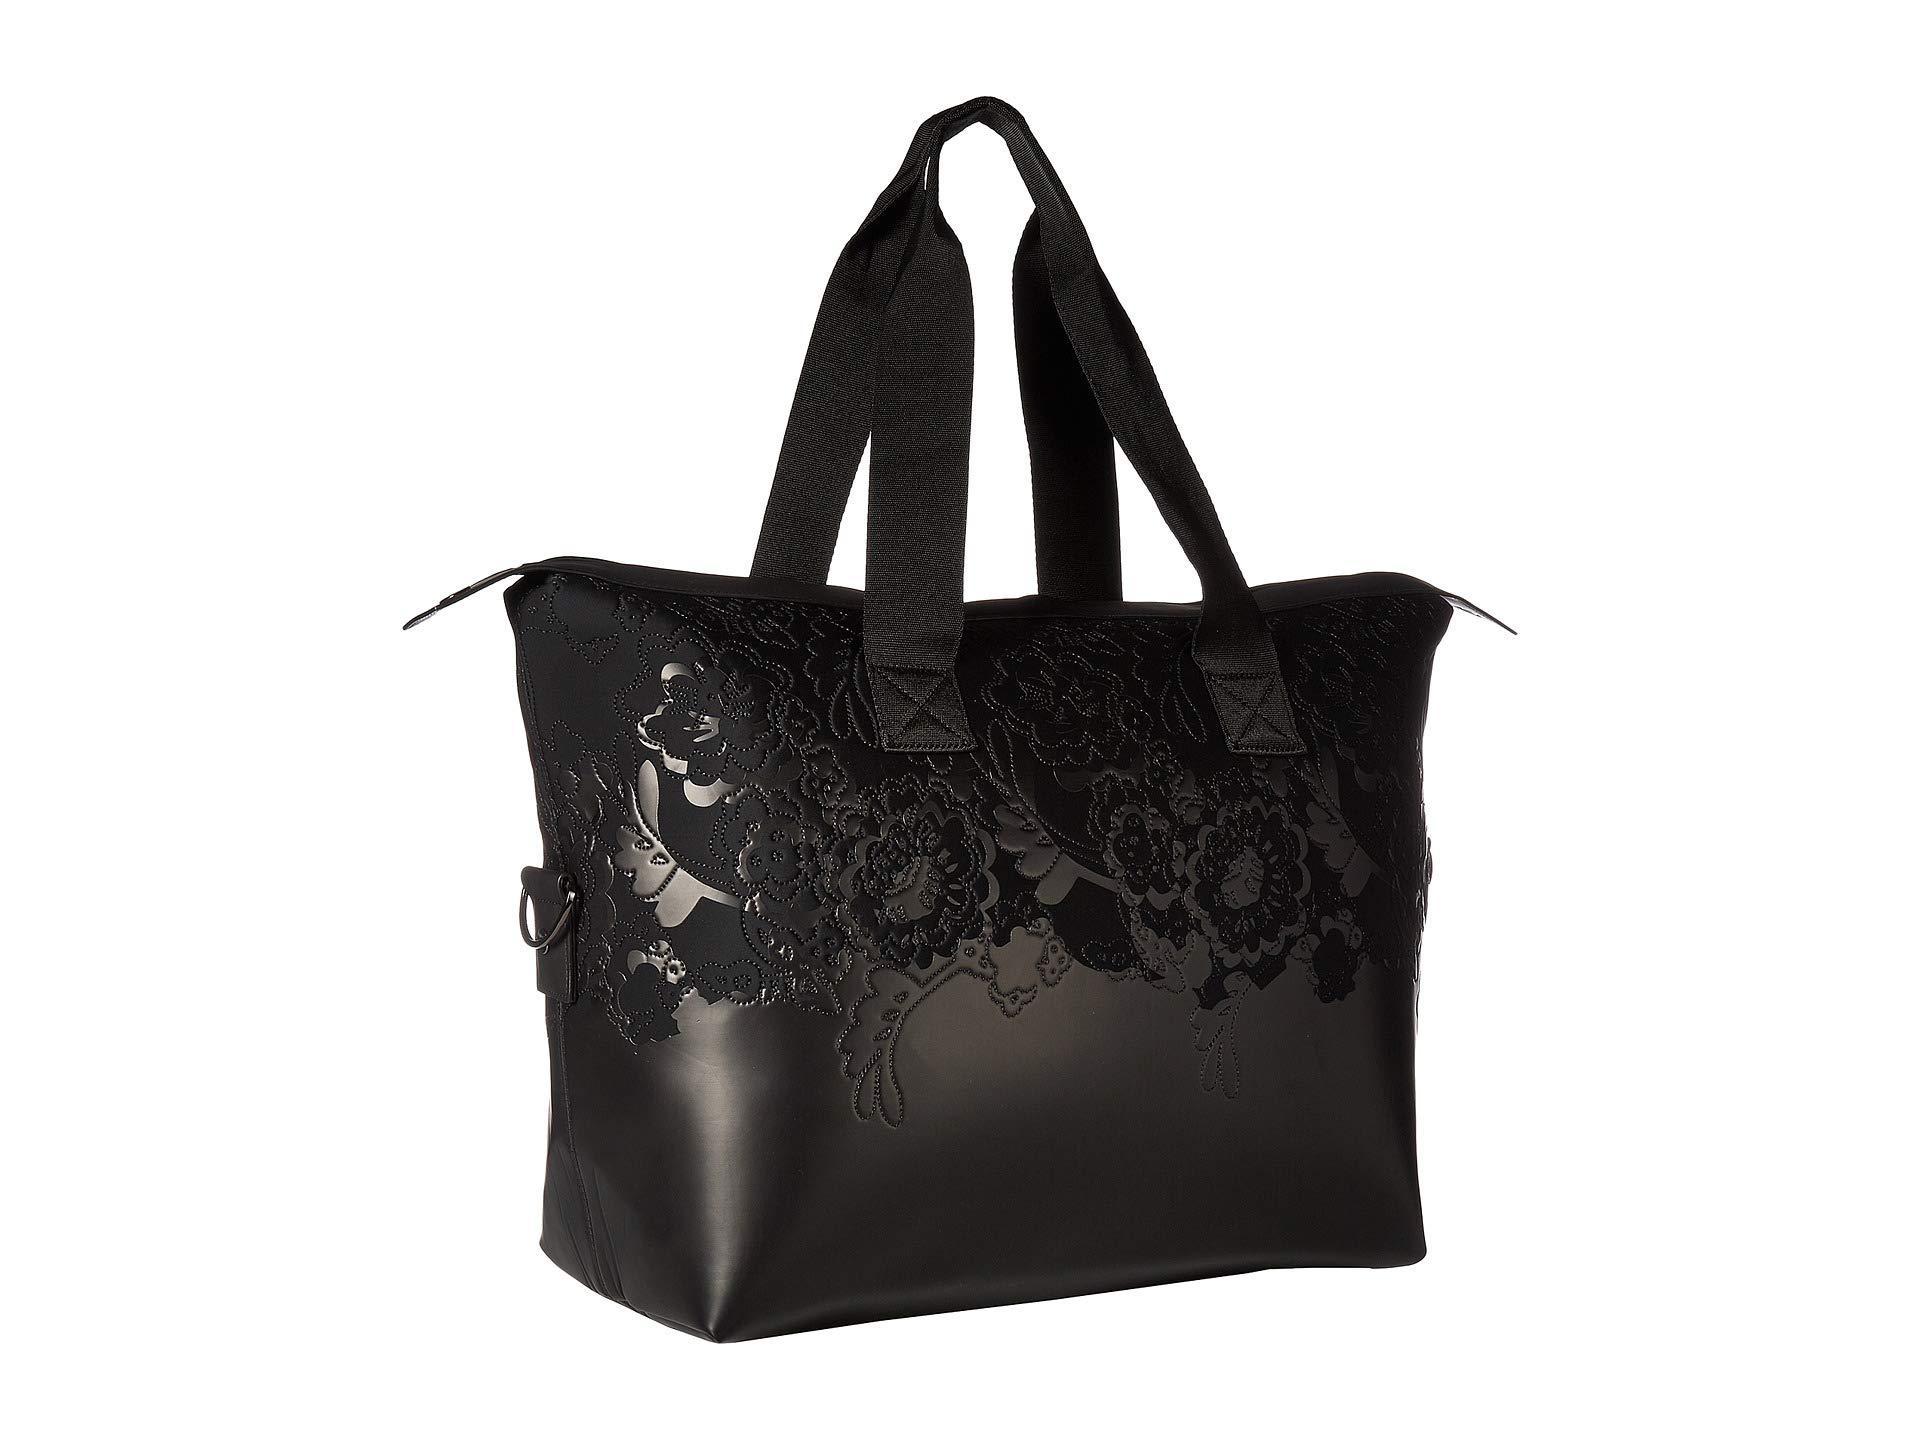 d57cacde7a48 Adidas By Stella McCartney - Black Medium Studio Bag - Lyst. View fullscreen